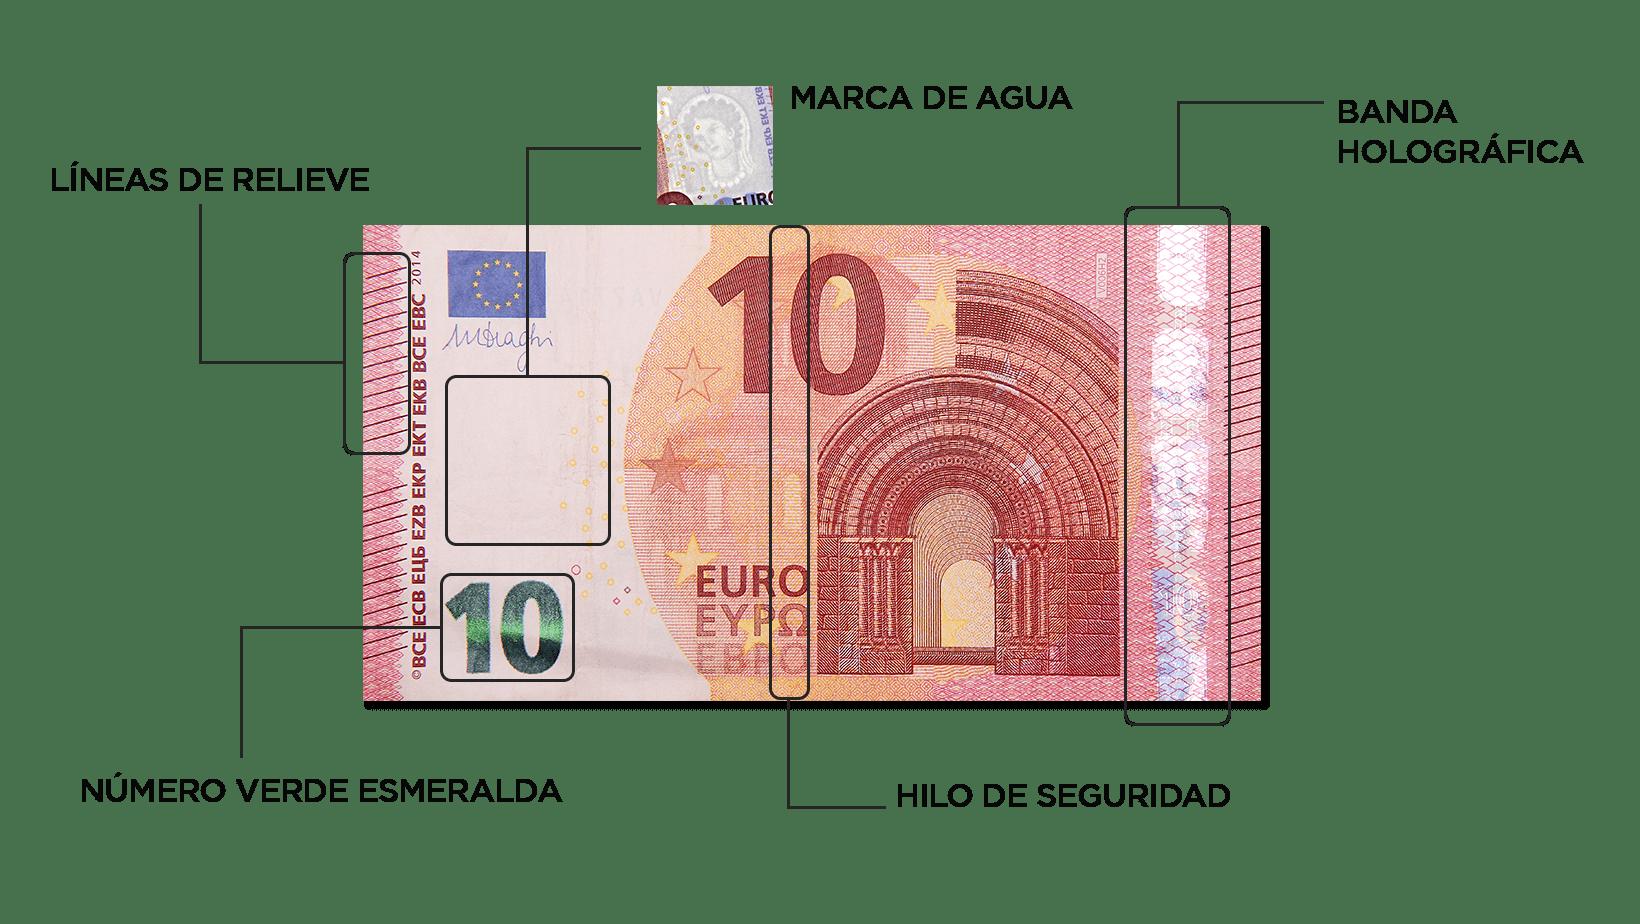 IMAGEN-MEDIDAS-DE-SEGURIDAD-BILLETE-EURO-10-BANK-NOTE-WATERMARK-CURRENCY.png